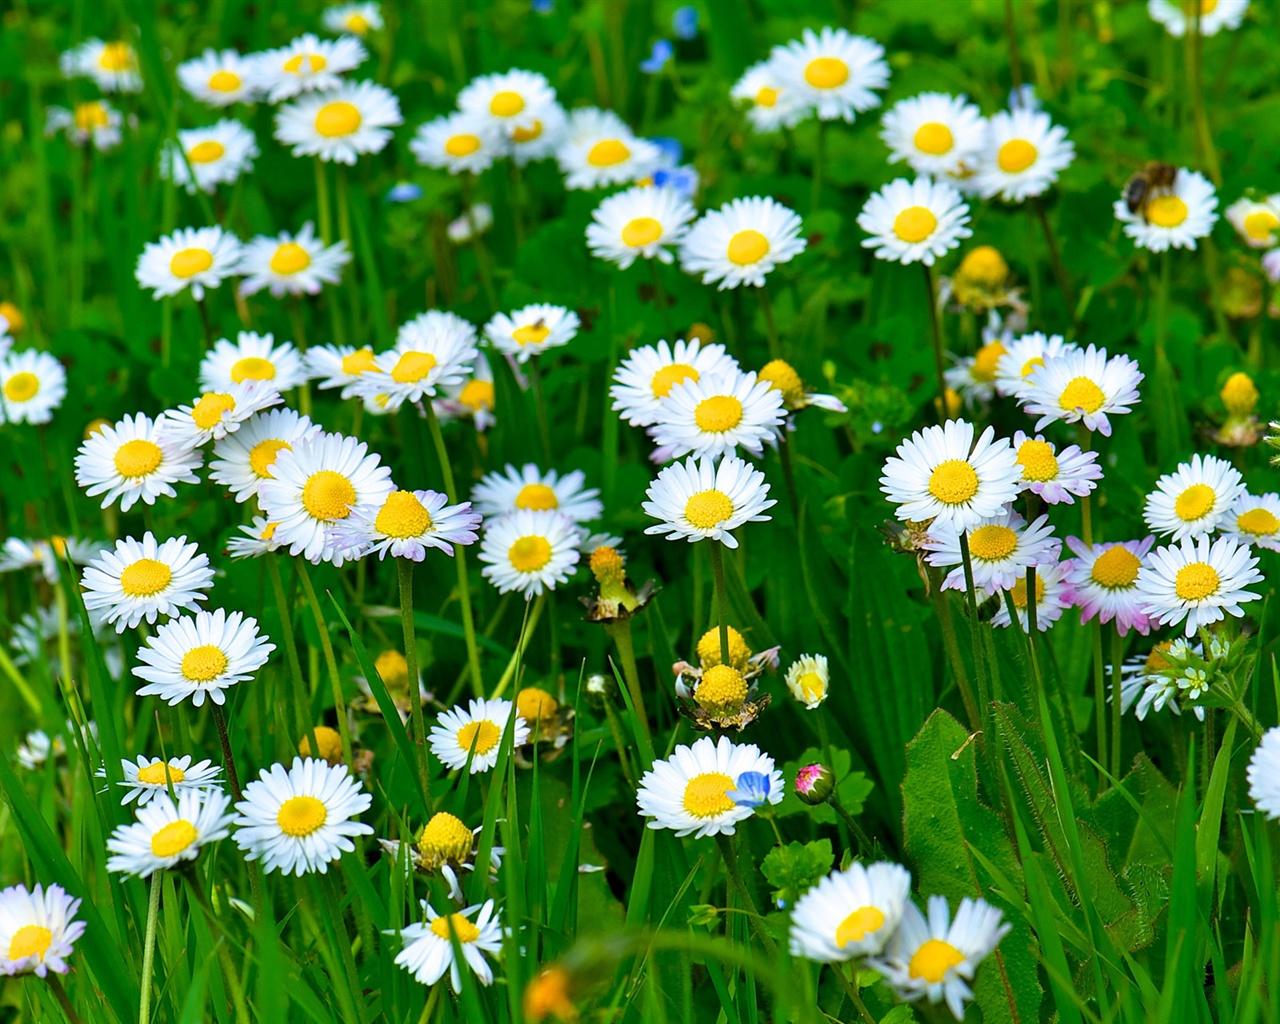 Wallpaper White Daisy Flowers Grass Leaves Green 1920x1200 Hd